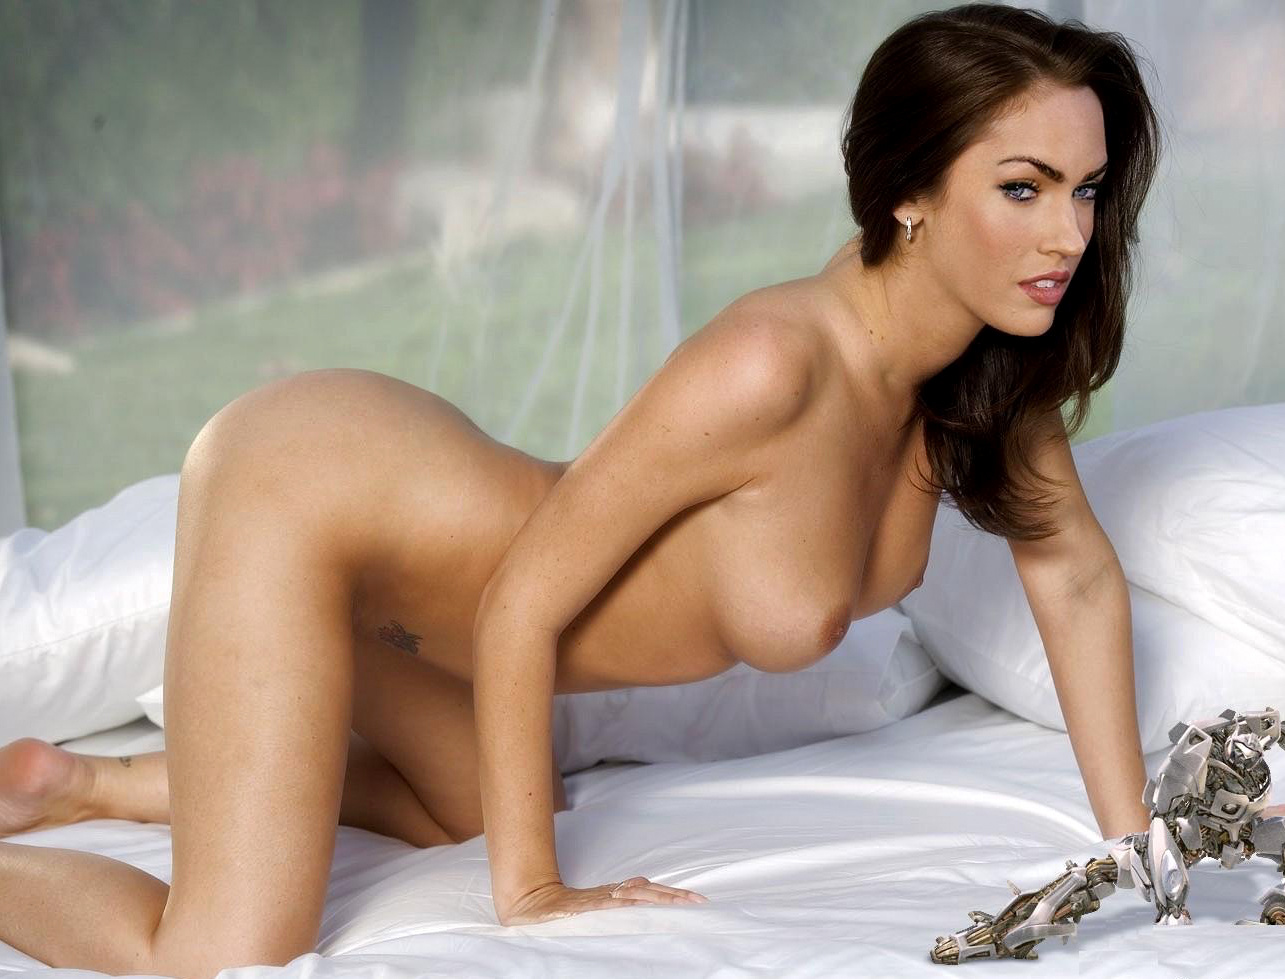 naked-megan-fox-pics-cerita-sex-porno-video